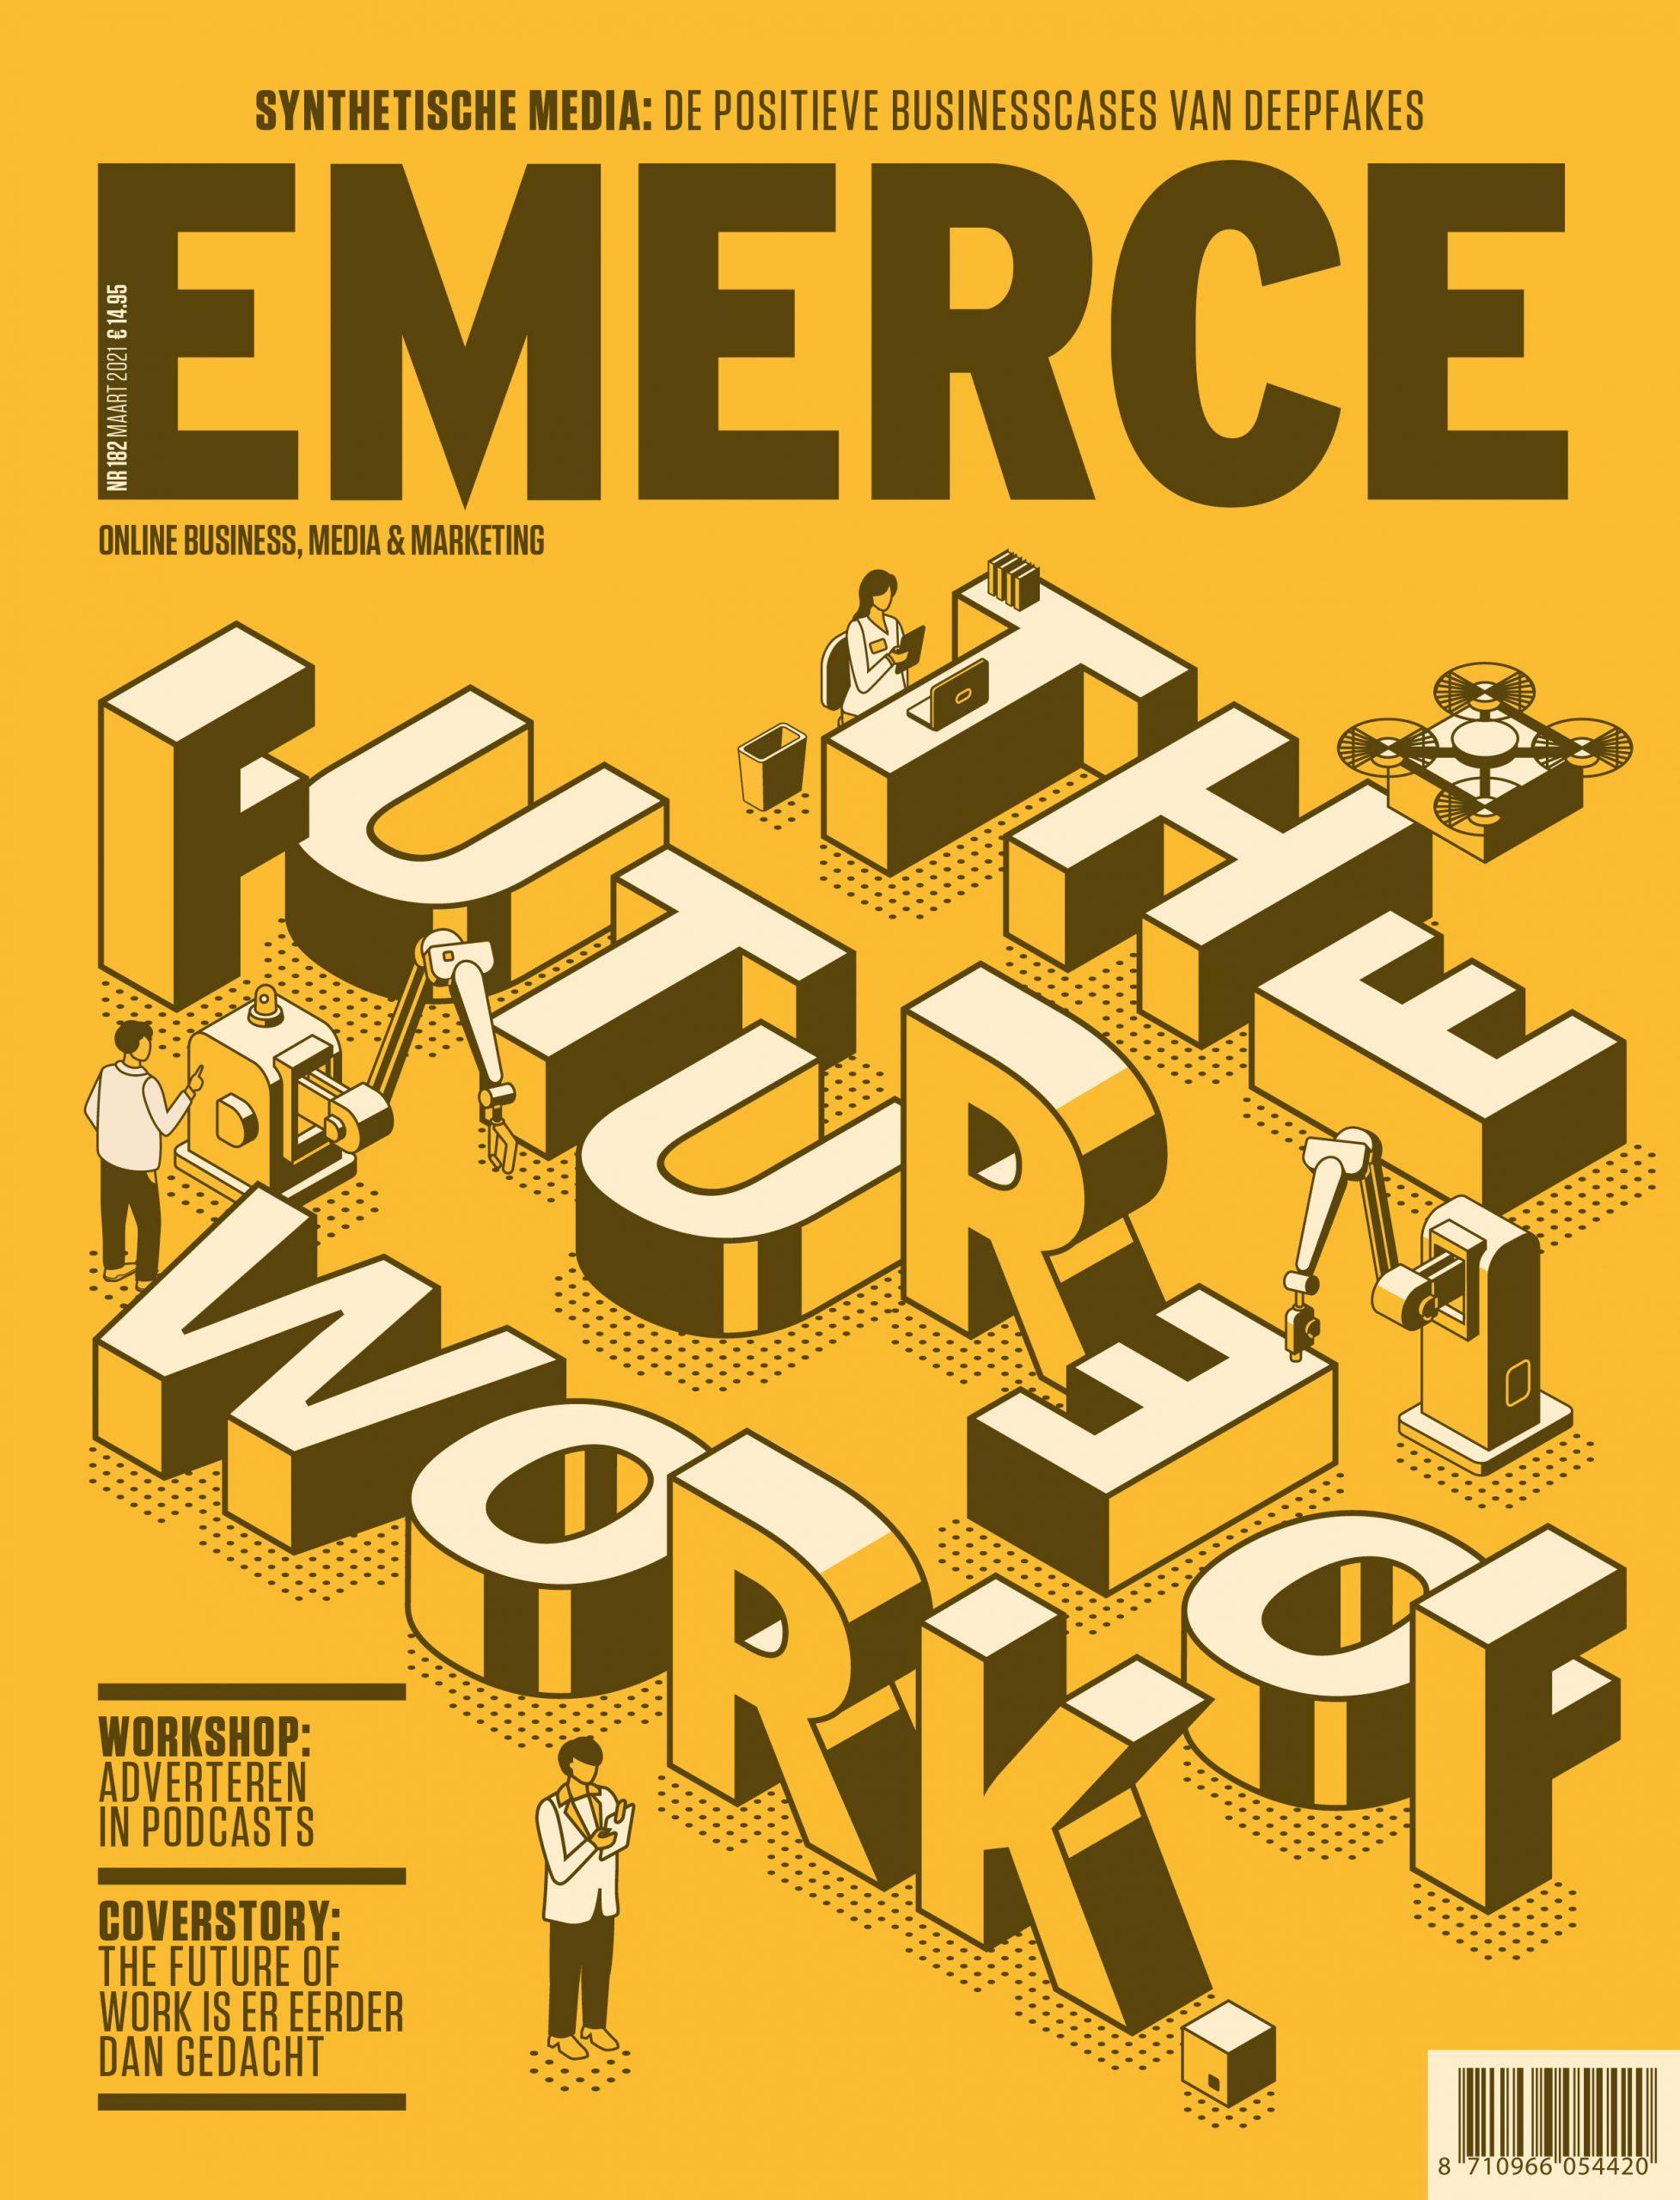 Emerce magazine #182 | Gratisdownload